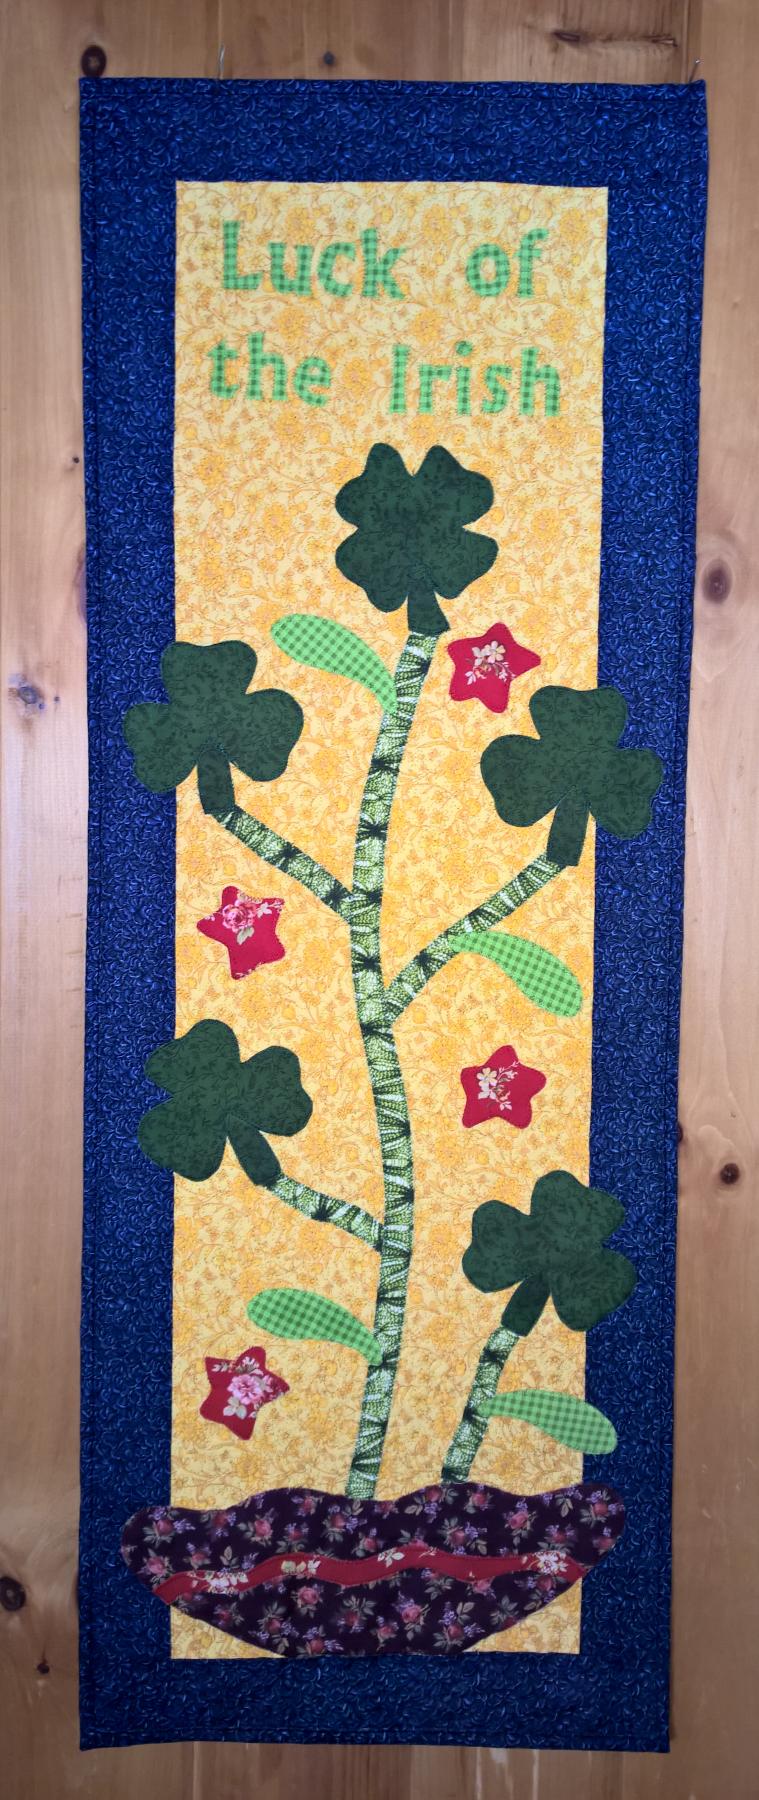 Luck of the Irish Table Runner